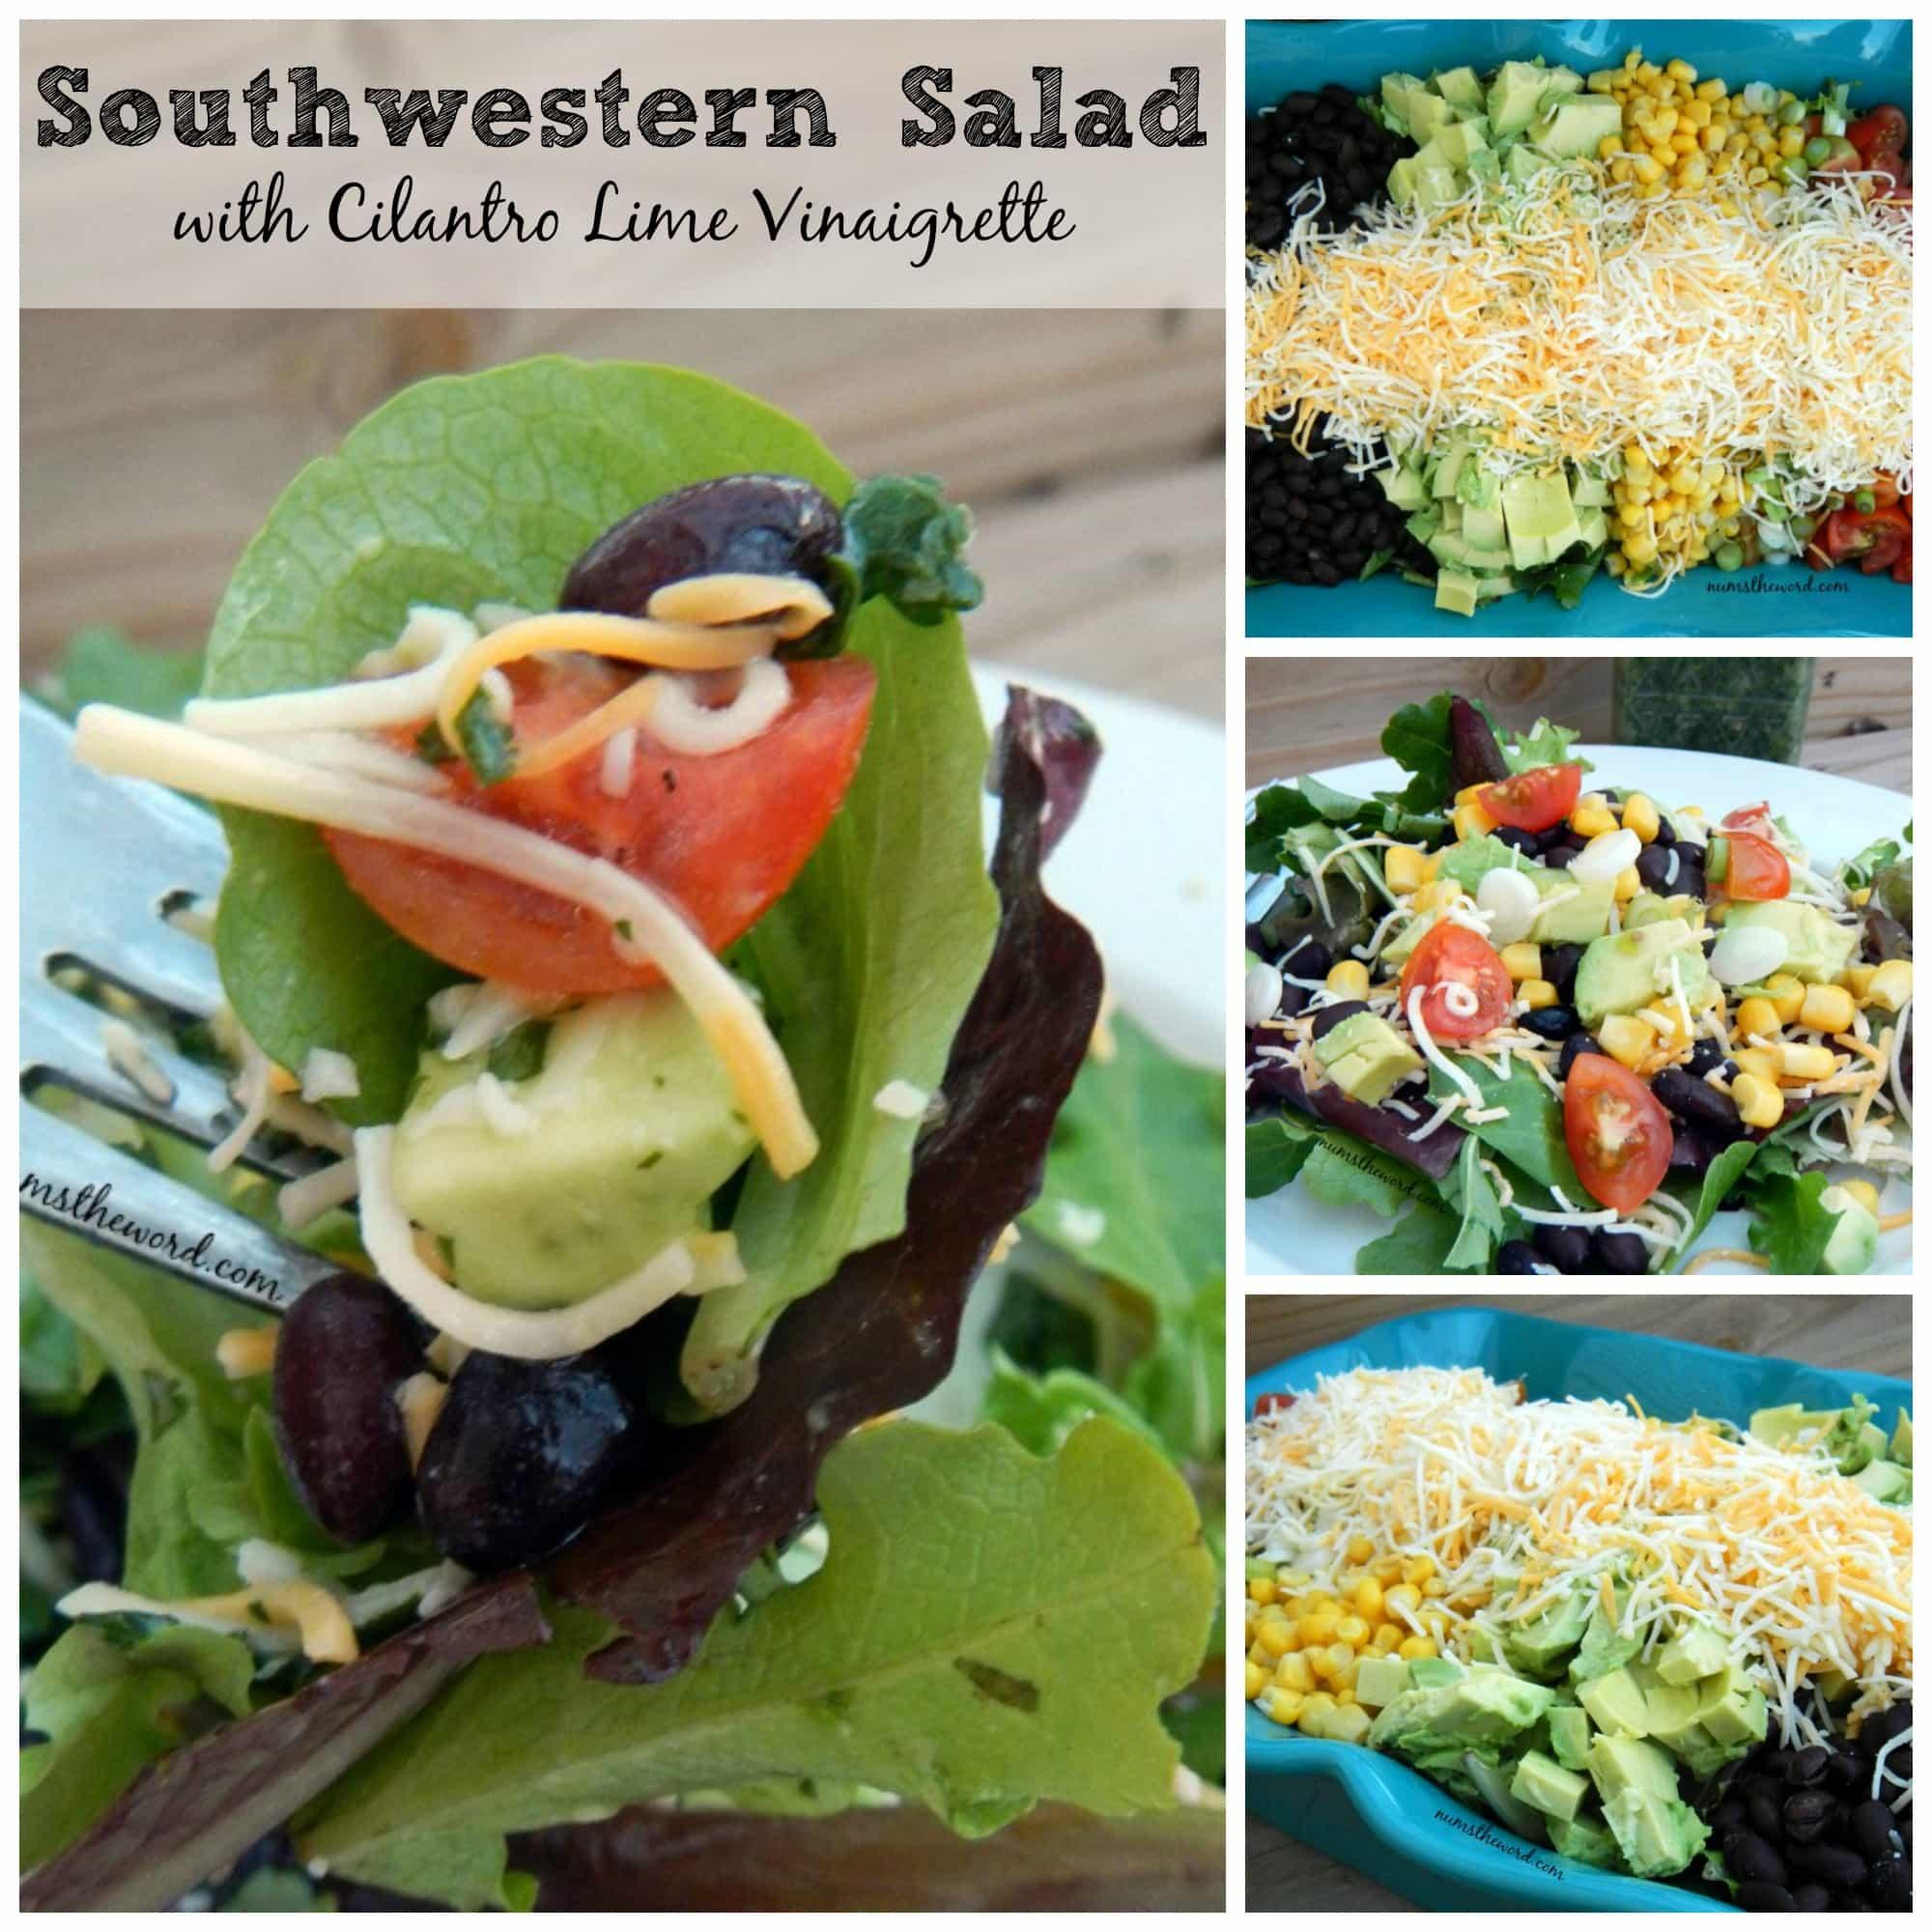 Southwestern Salad